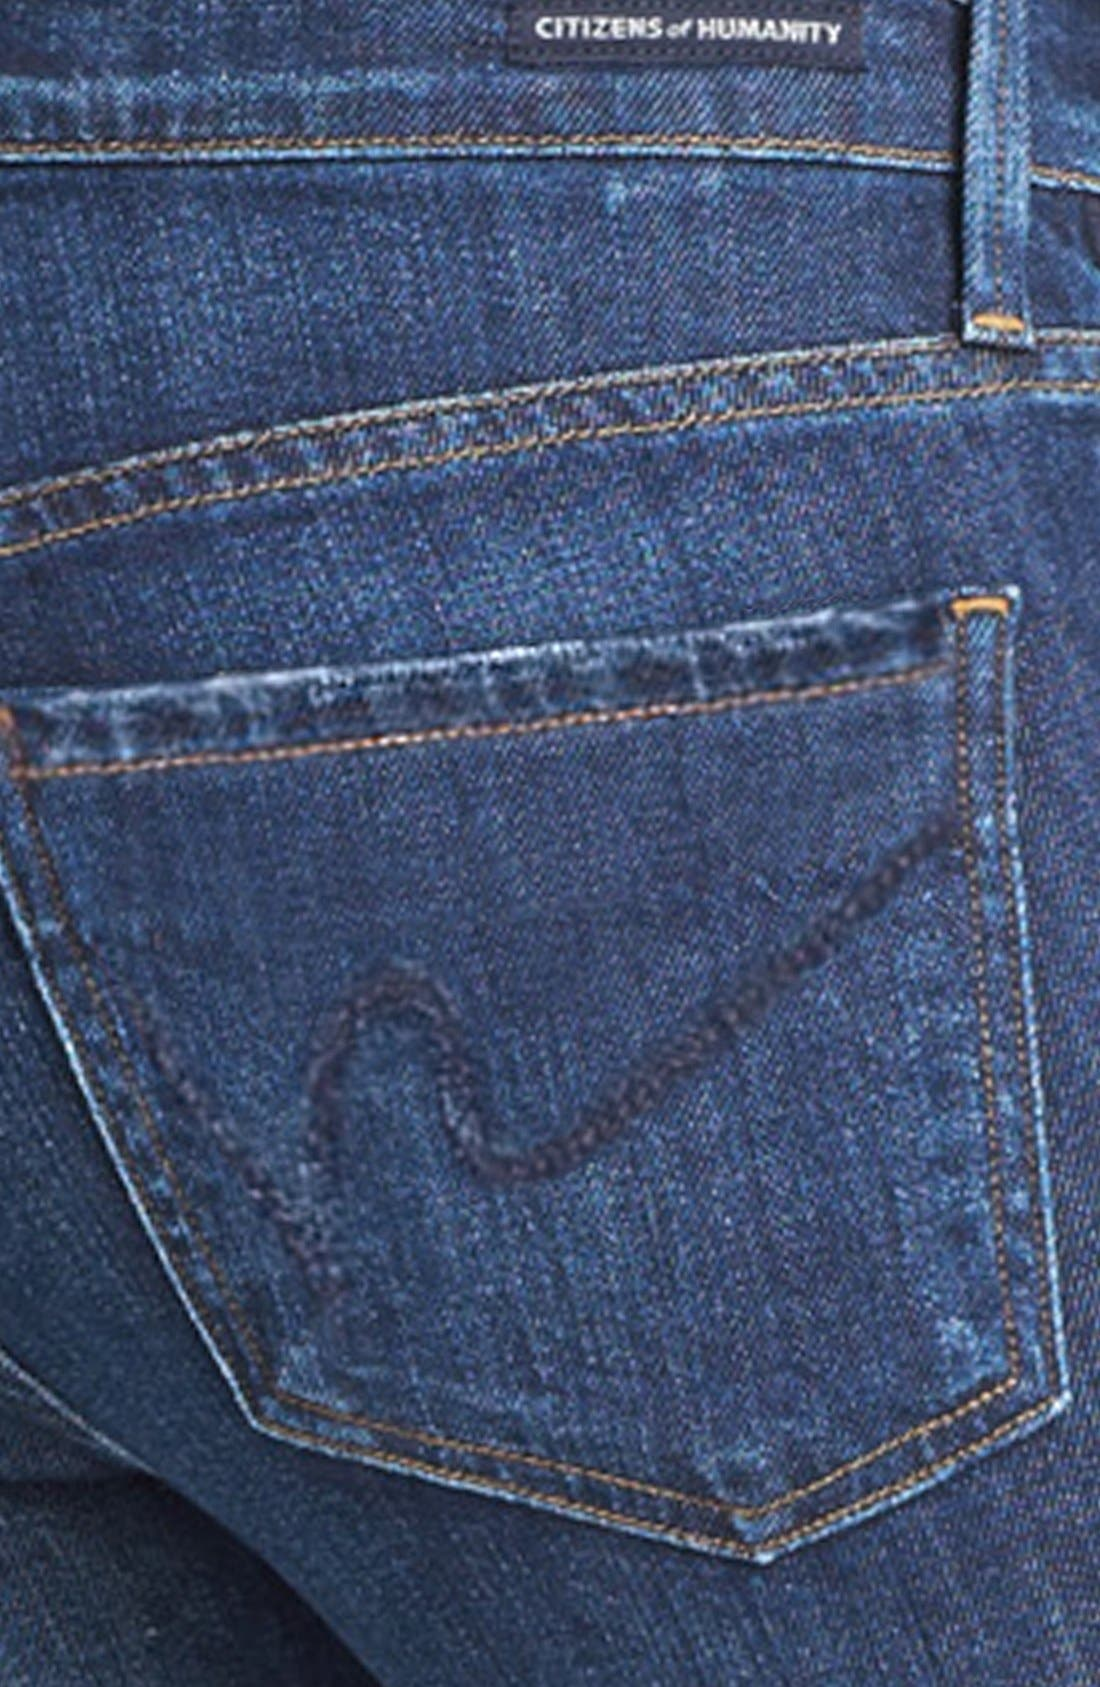 Alternate Image 3  - Citizens of Humanity 'Emmanuelle' Slim Bootcut Jeans (Element)